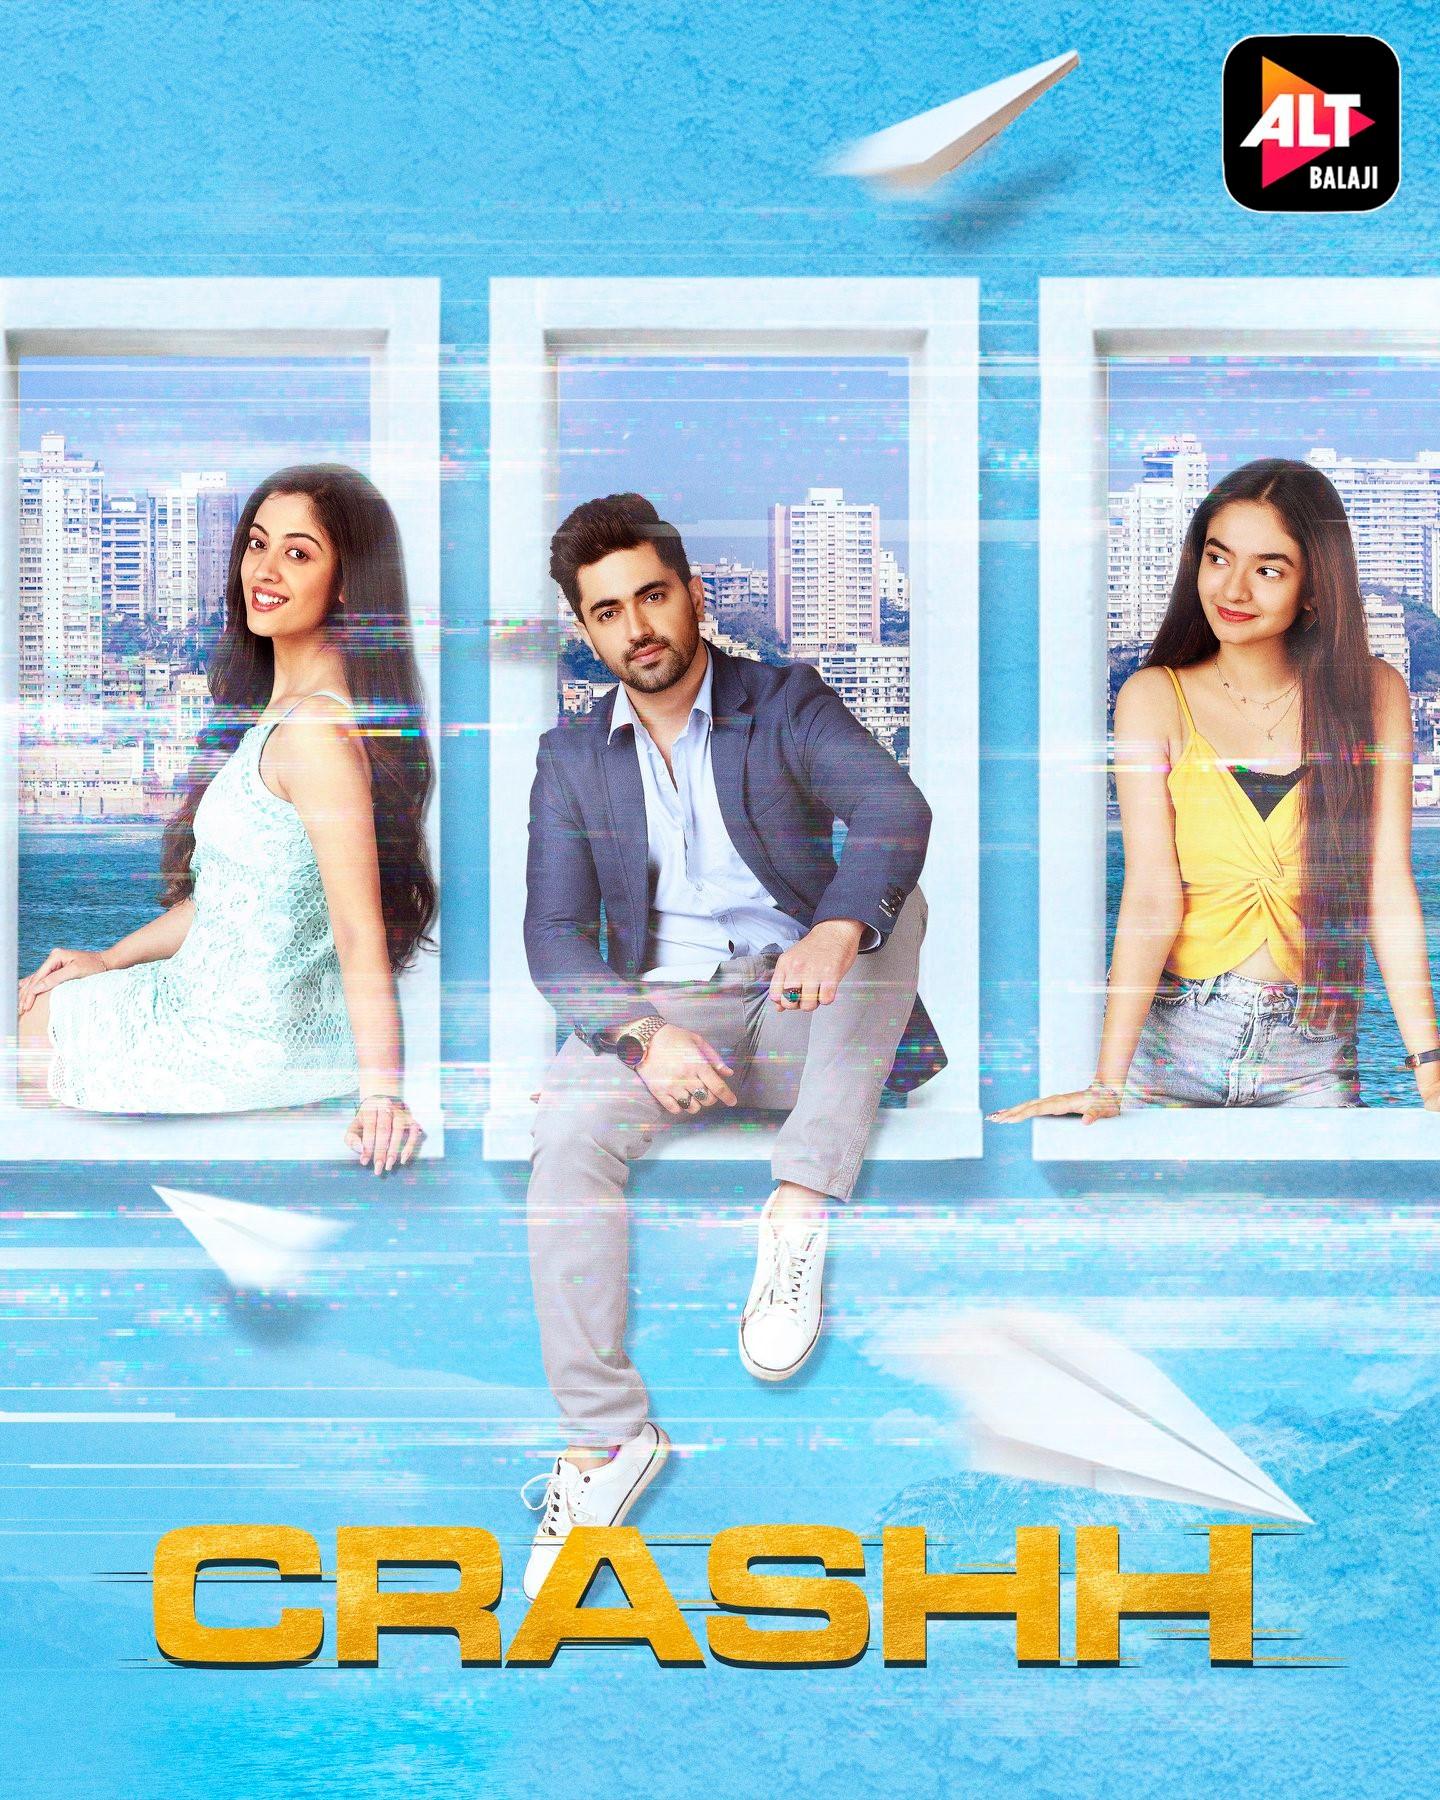 Crashh S01 2021 Hindi ALTBalaji Original Complete Web Series 1080p HDRip 3GB Download